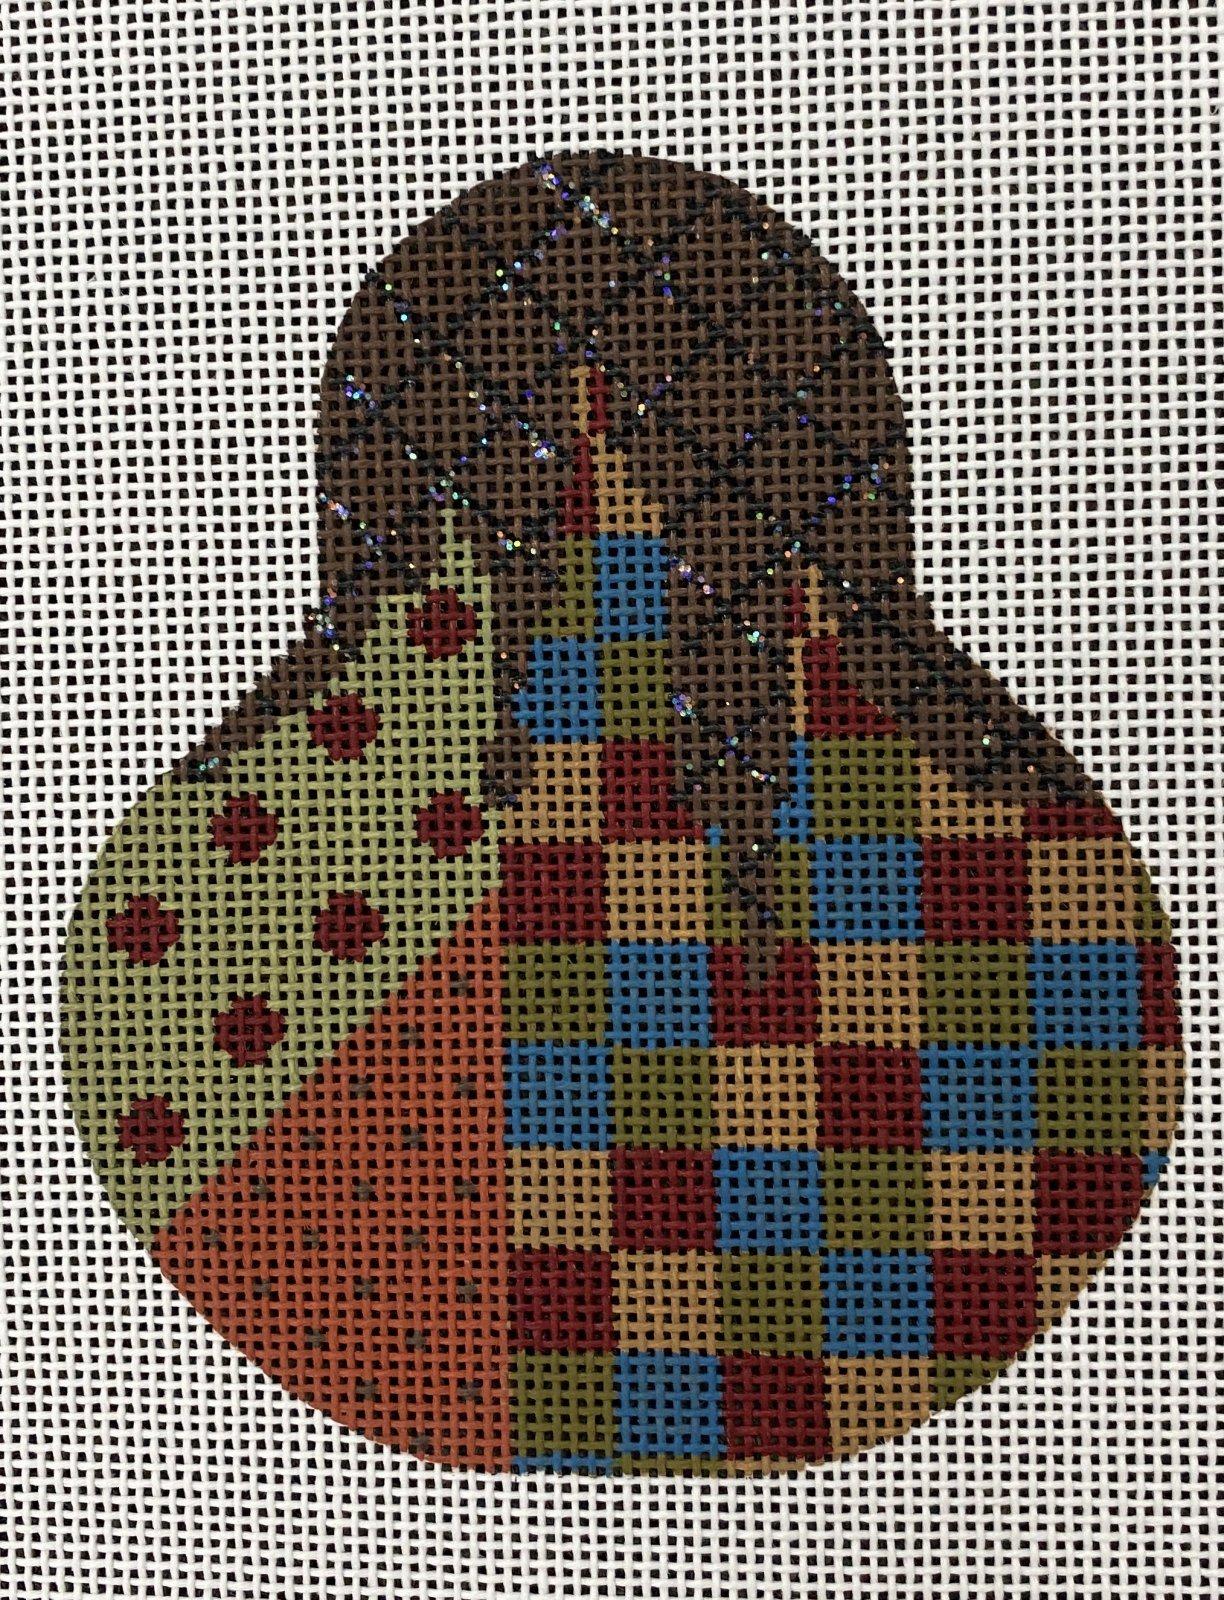 Autumn Checkered Madness, 3.5x4, 18M